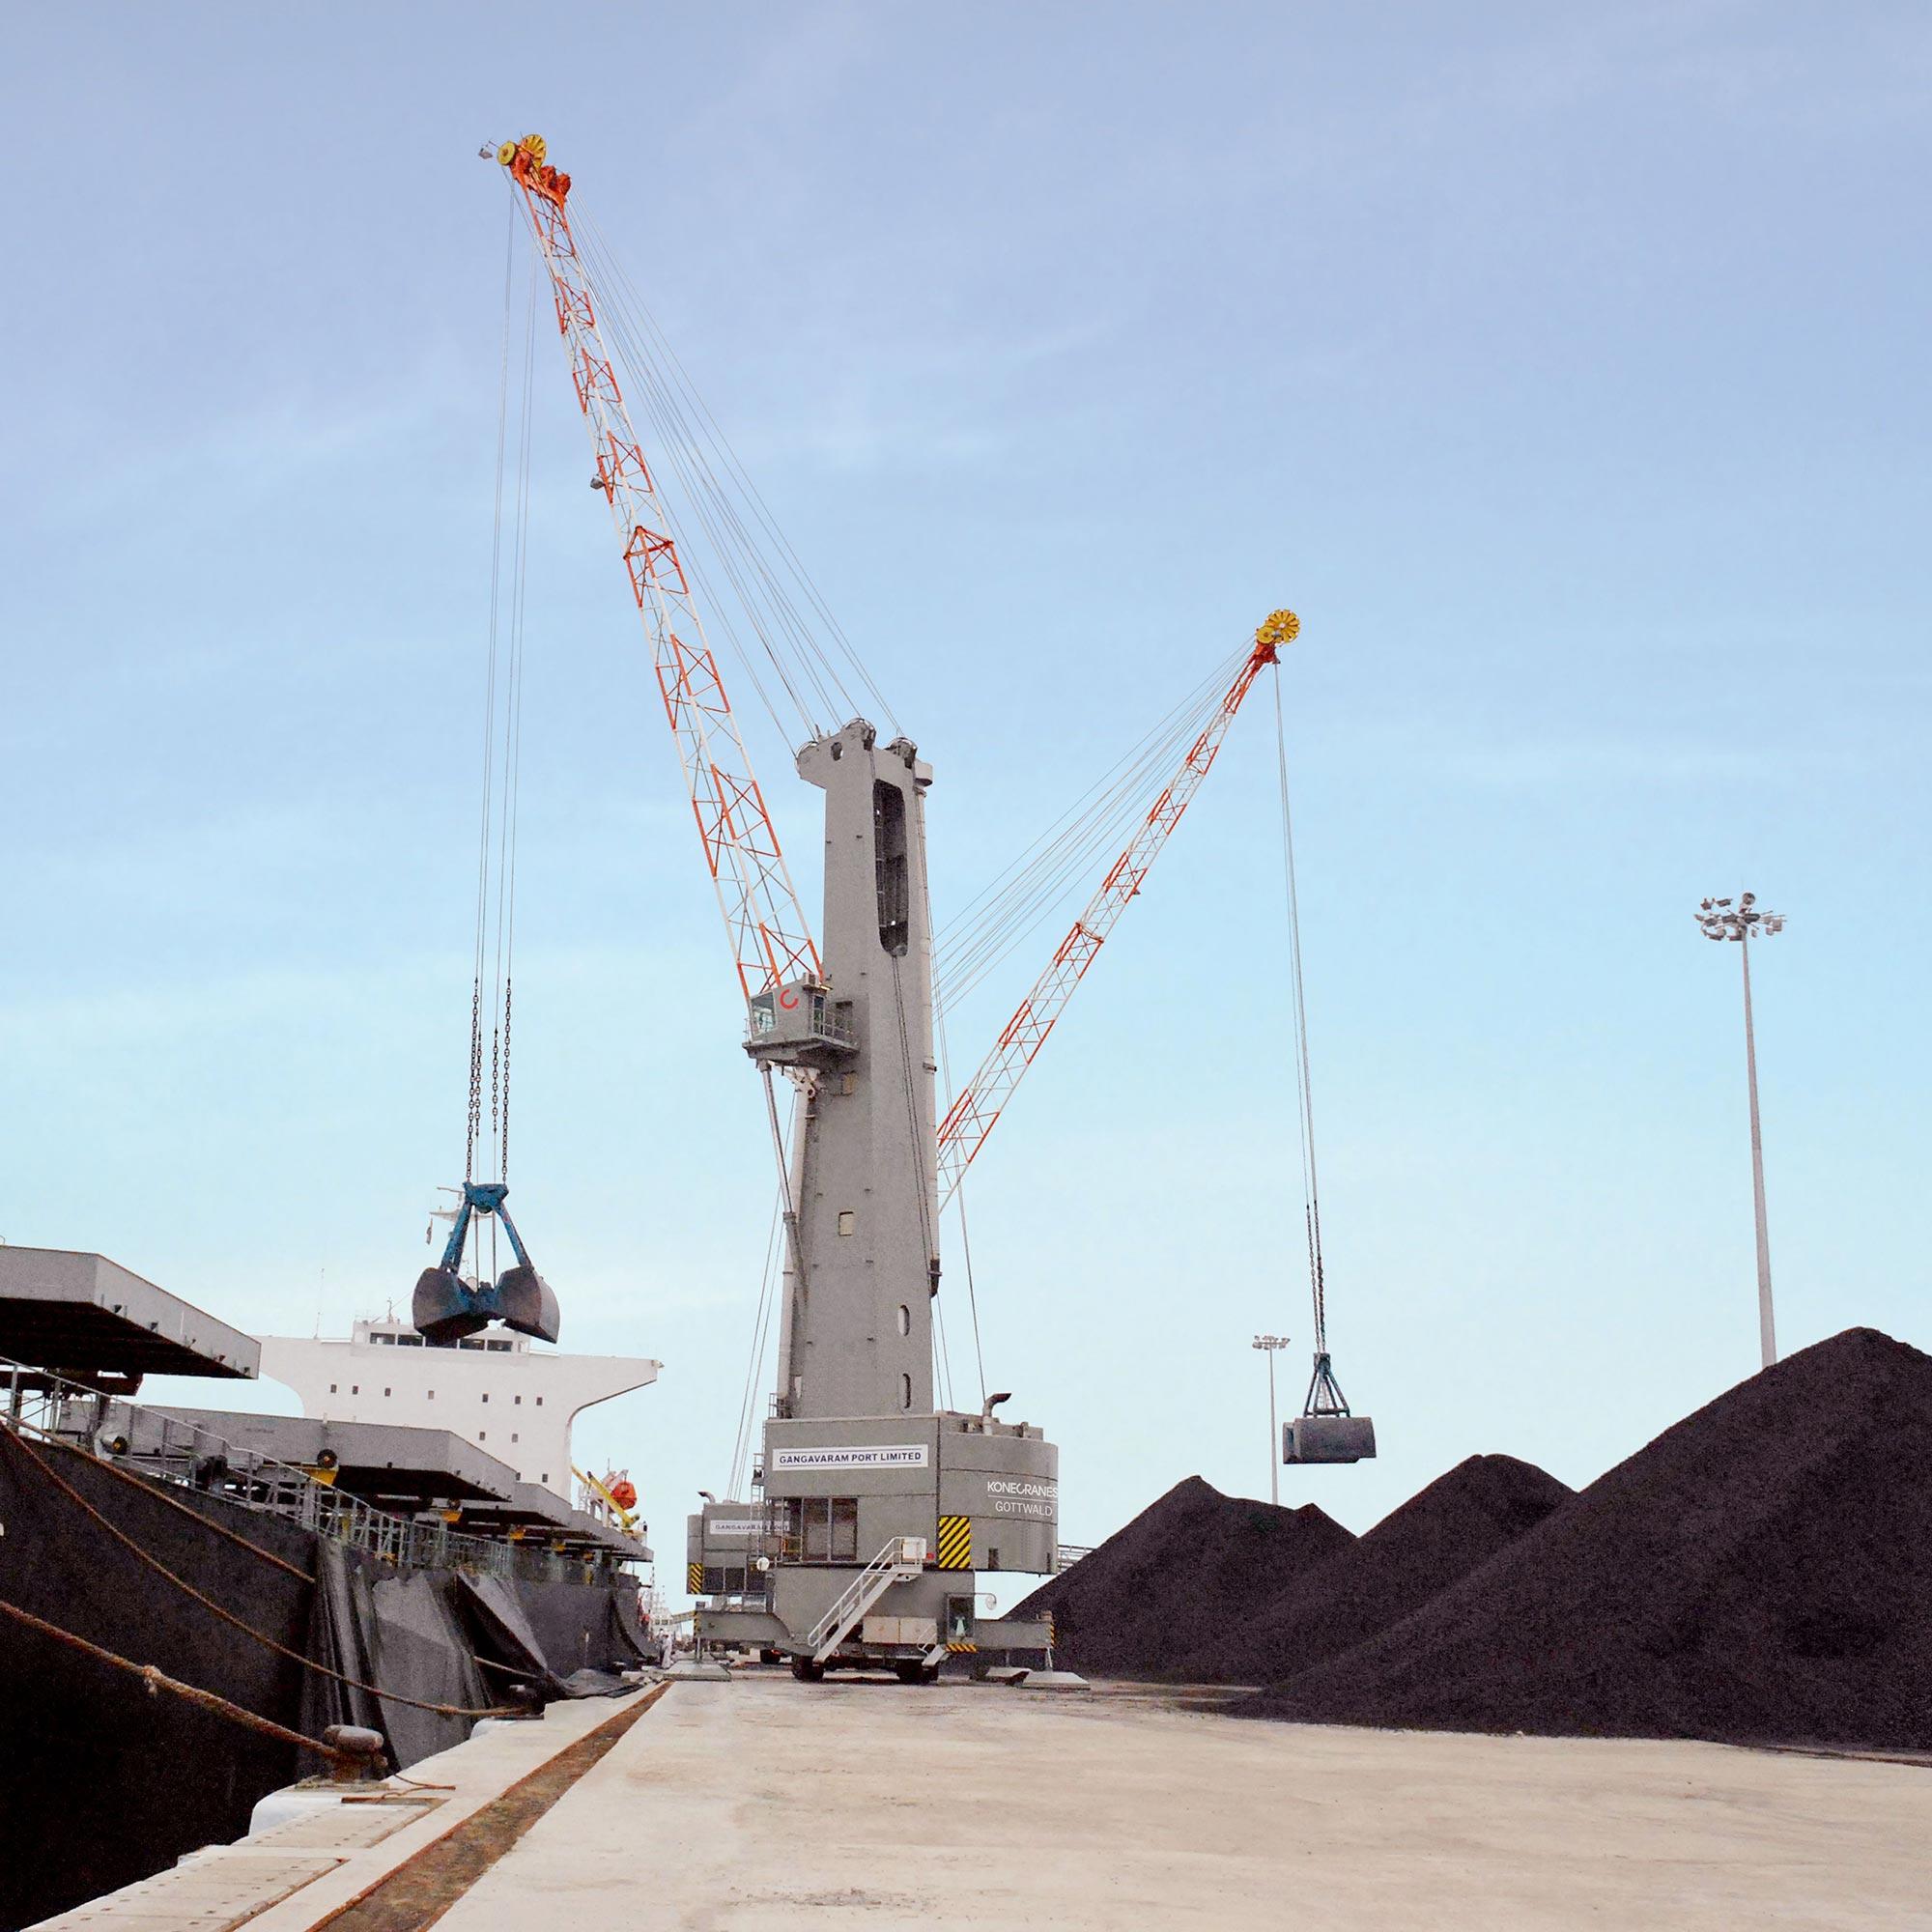 Konecranes Gottwald mobile harbor crane MHC bulk handling grab mode